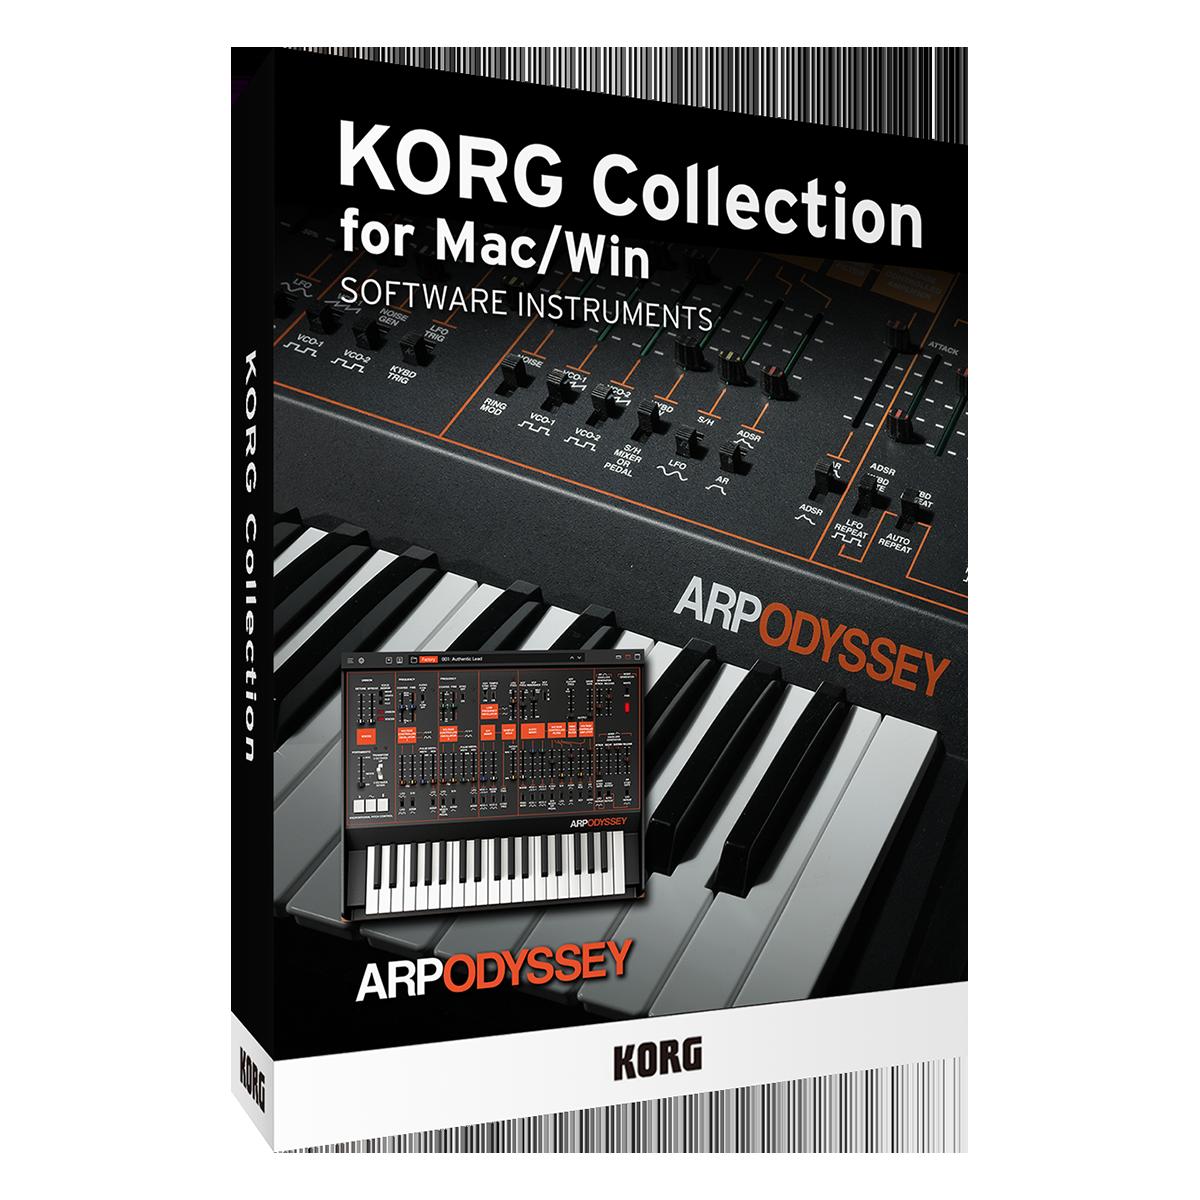 KORG Collection 3 - ARP ODYSSEY